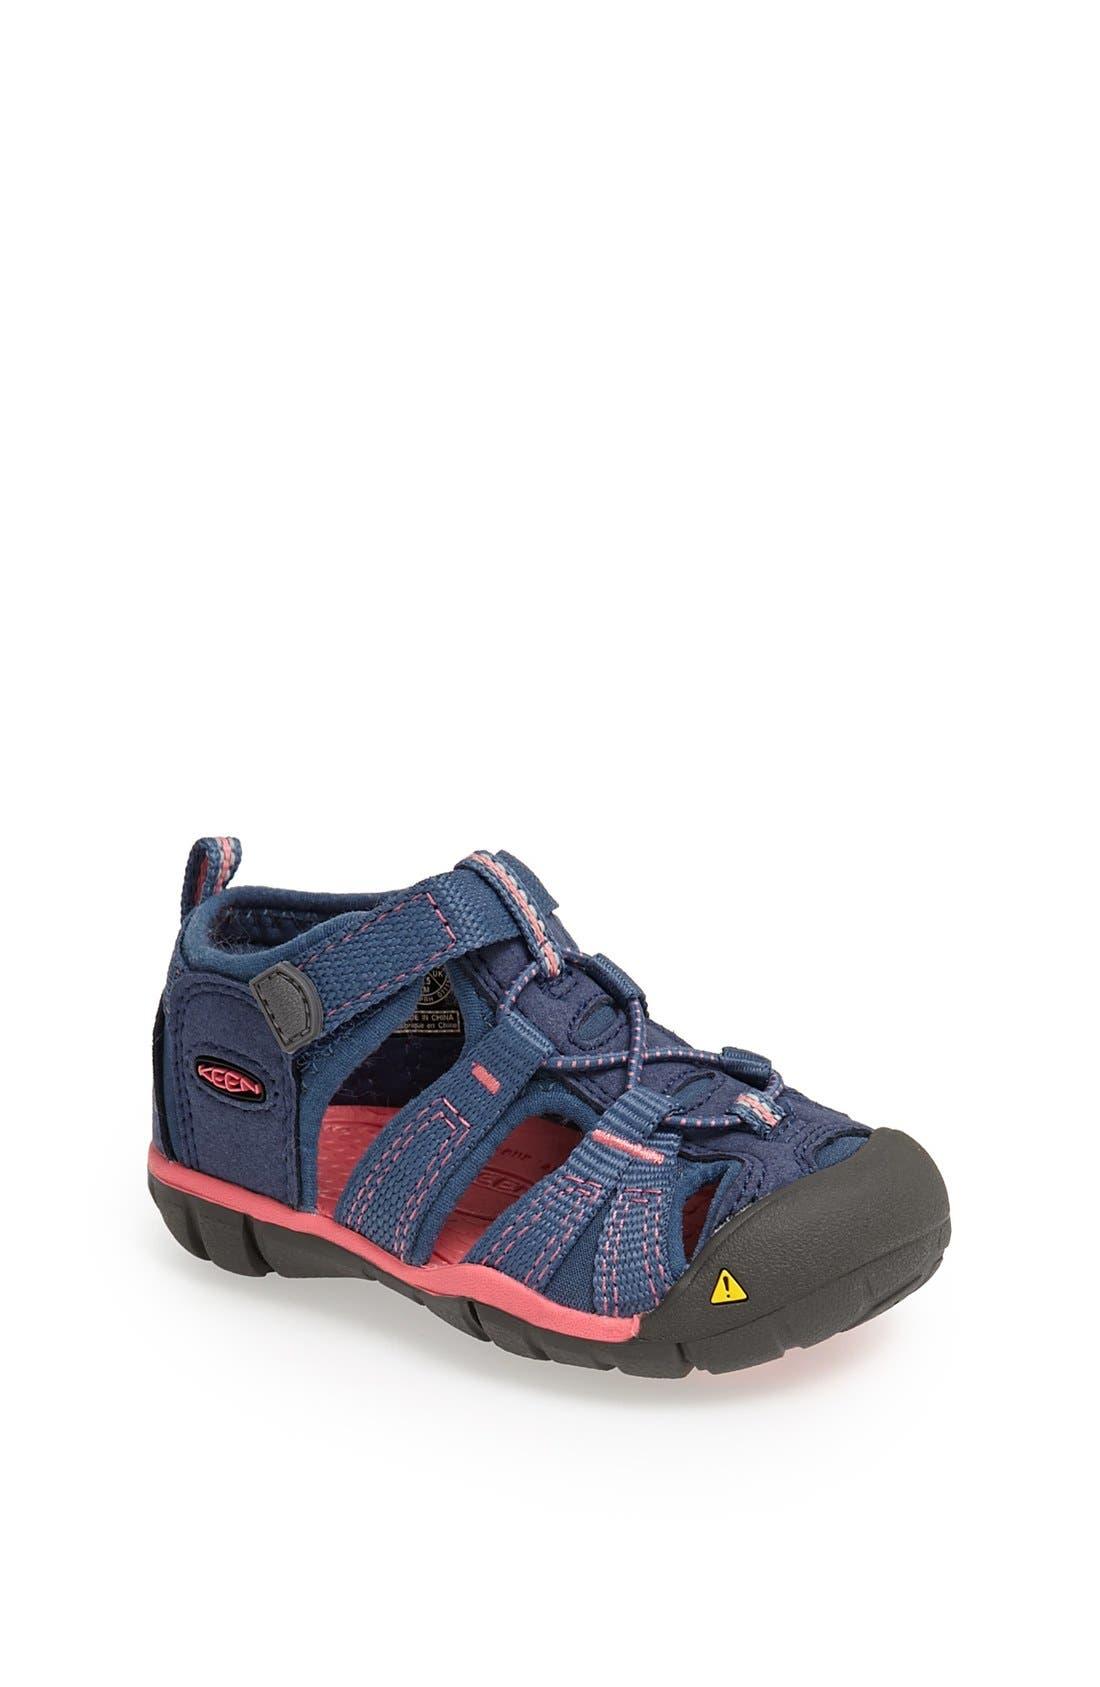 'Seacamp II' Waterproof Sandal,                             Main thumbnail 1, color,                             Blue Rose